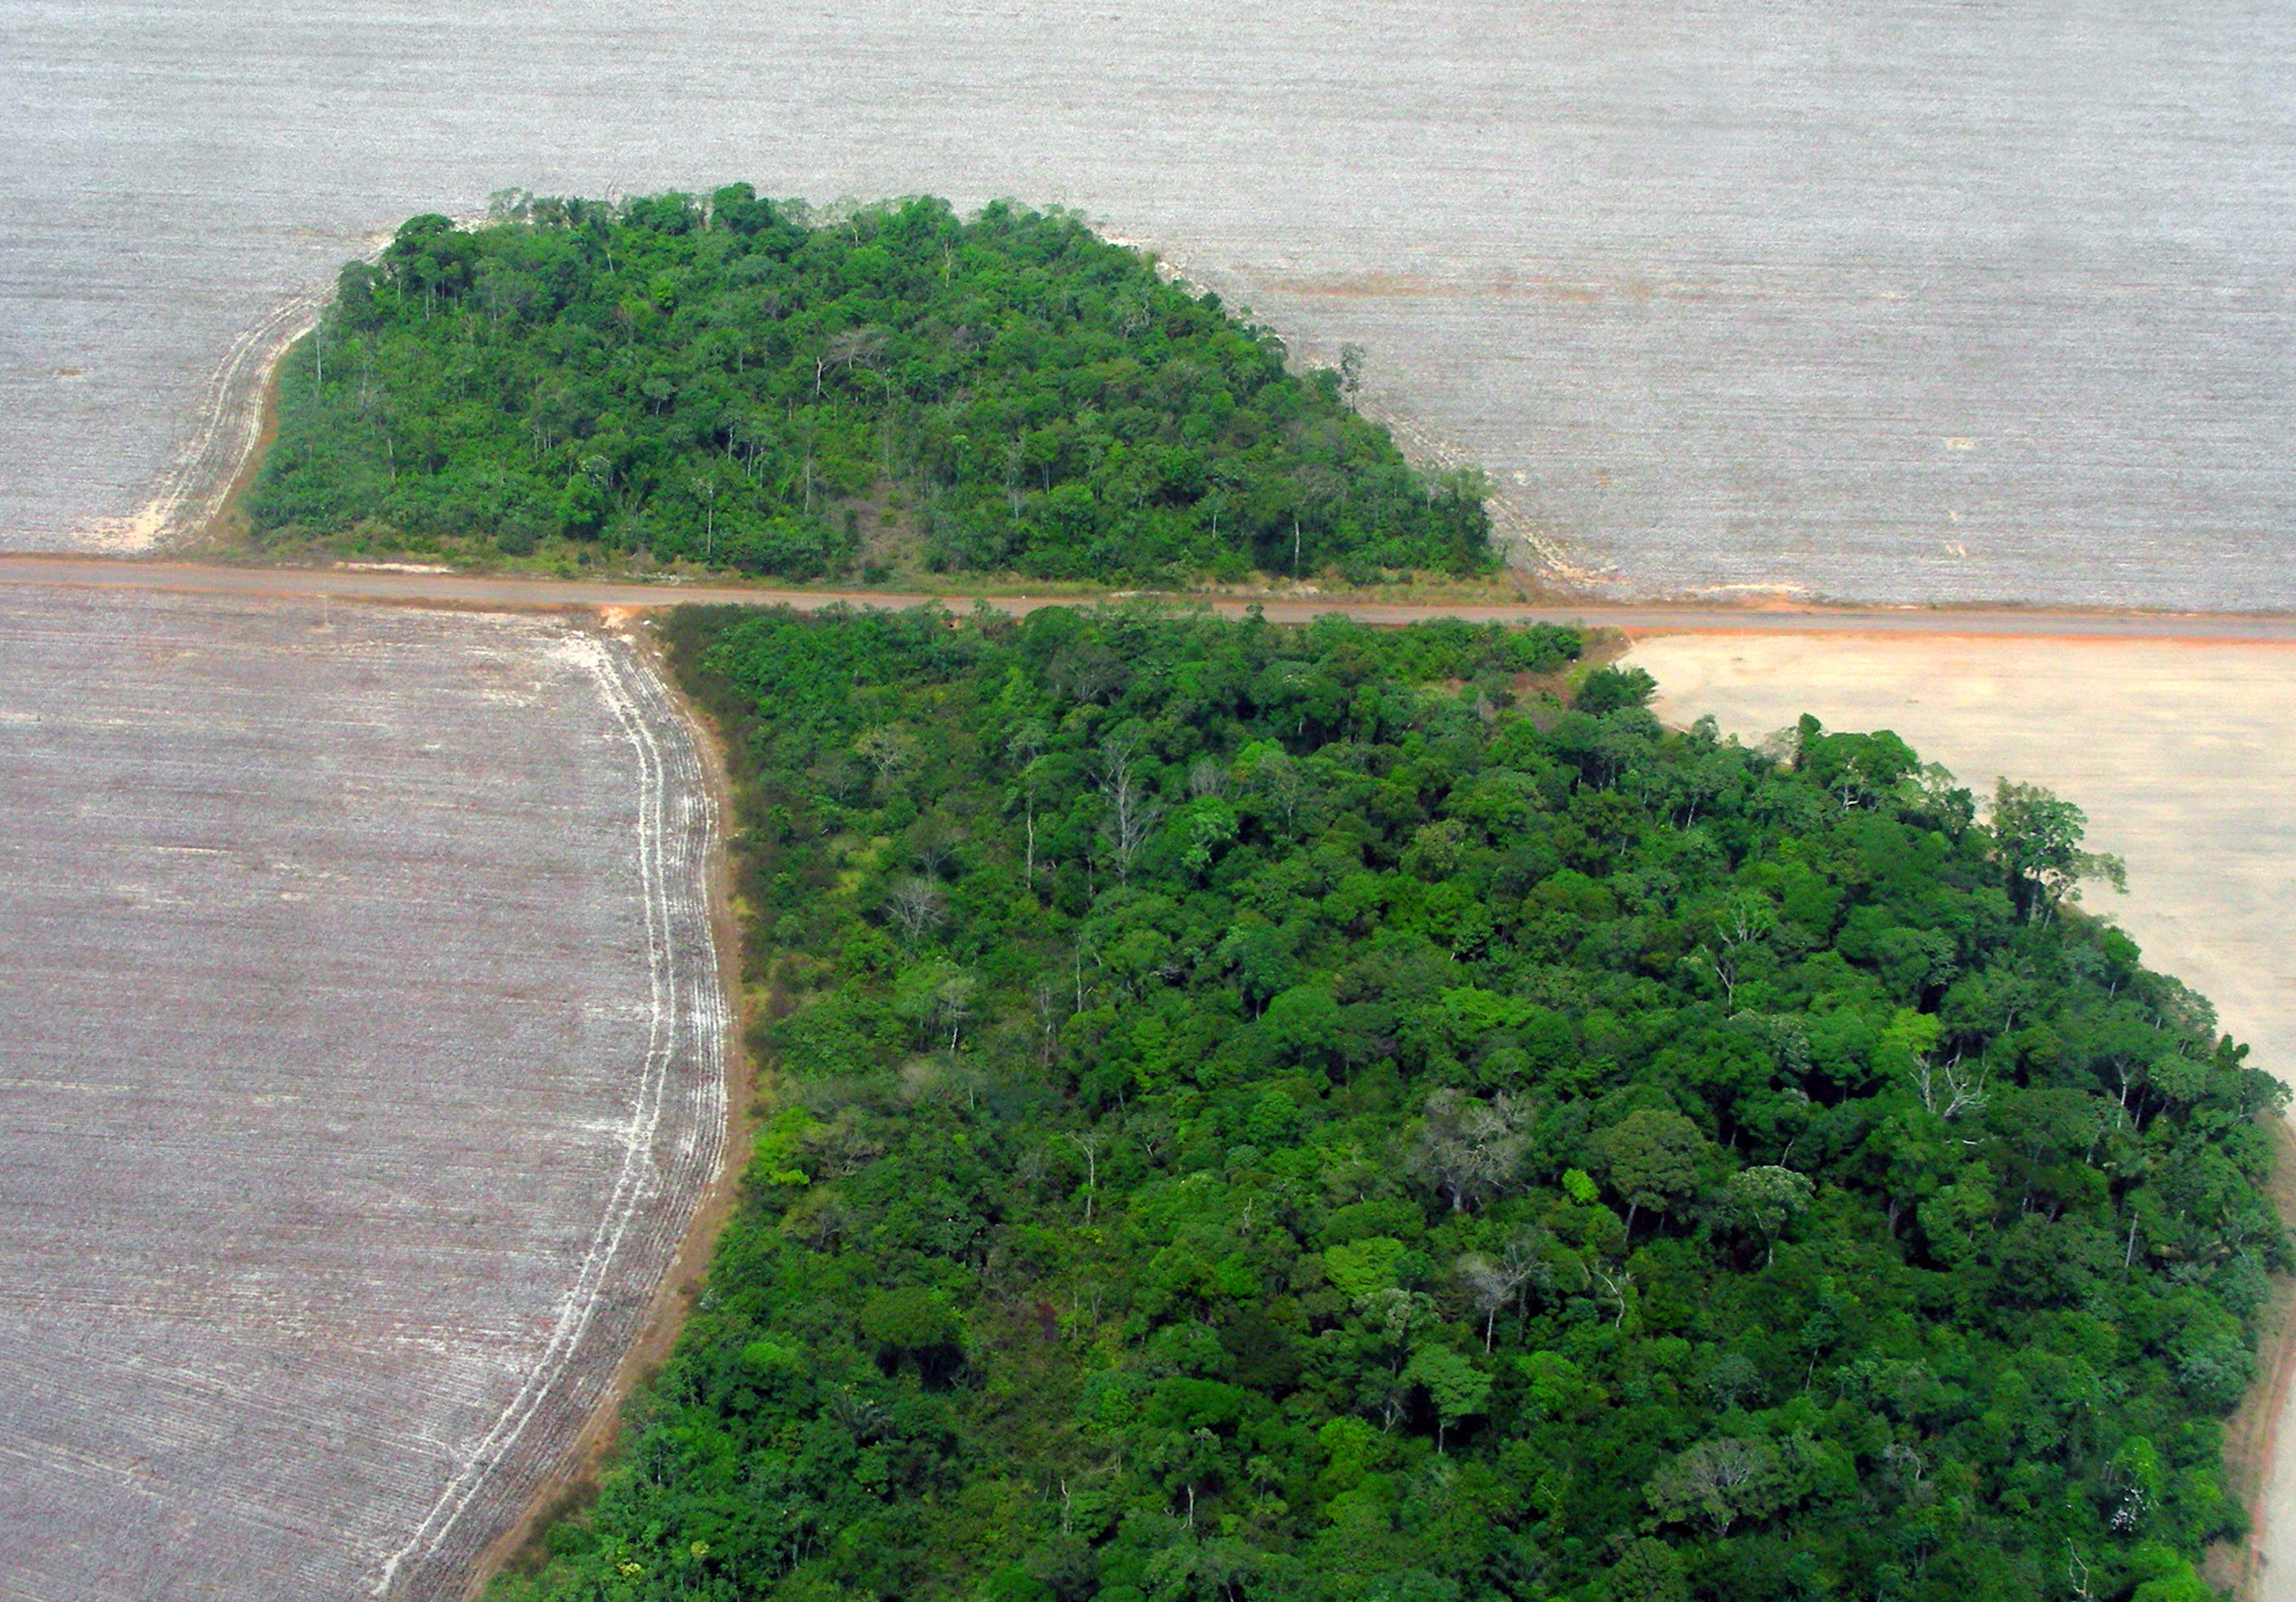 Description Mato Grosso deforestation  Pedro Biondi  12ago2007 jpgAmazon Rainforest Map Deforestation